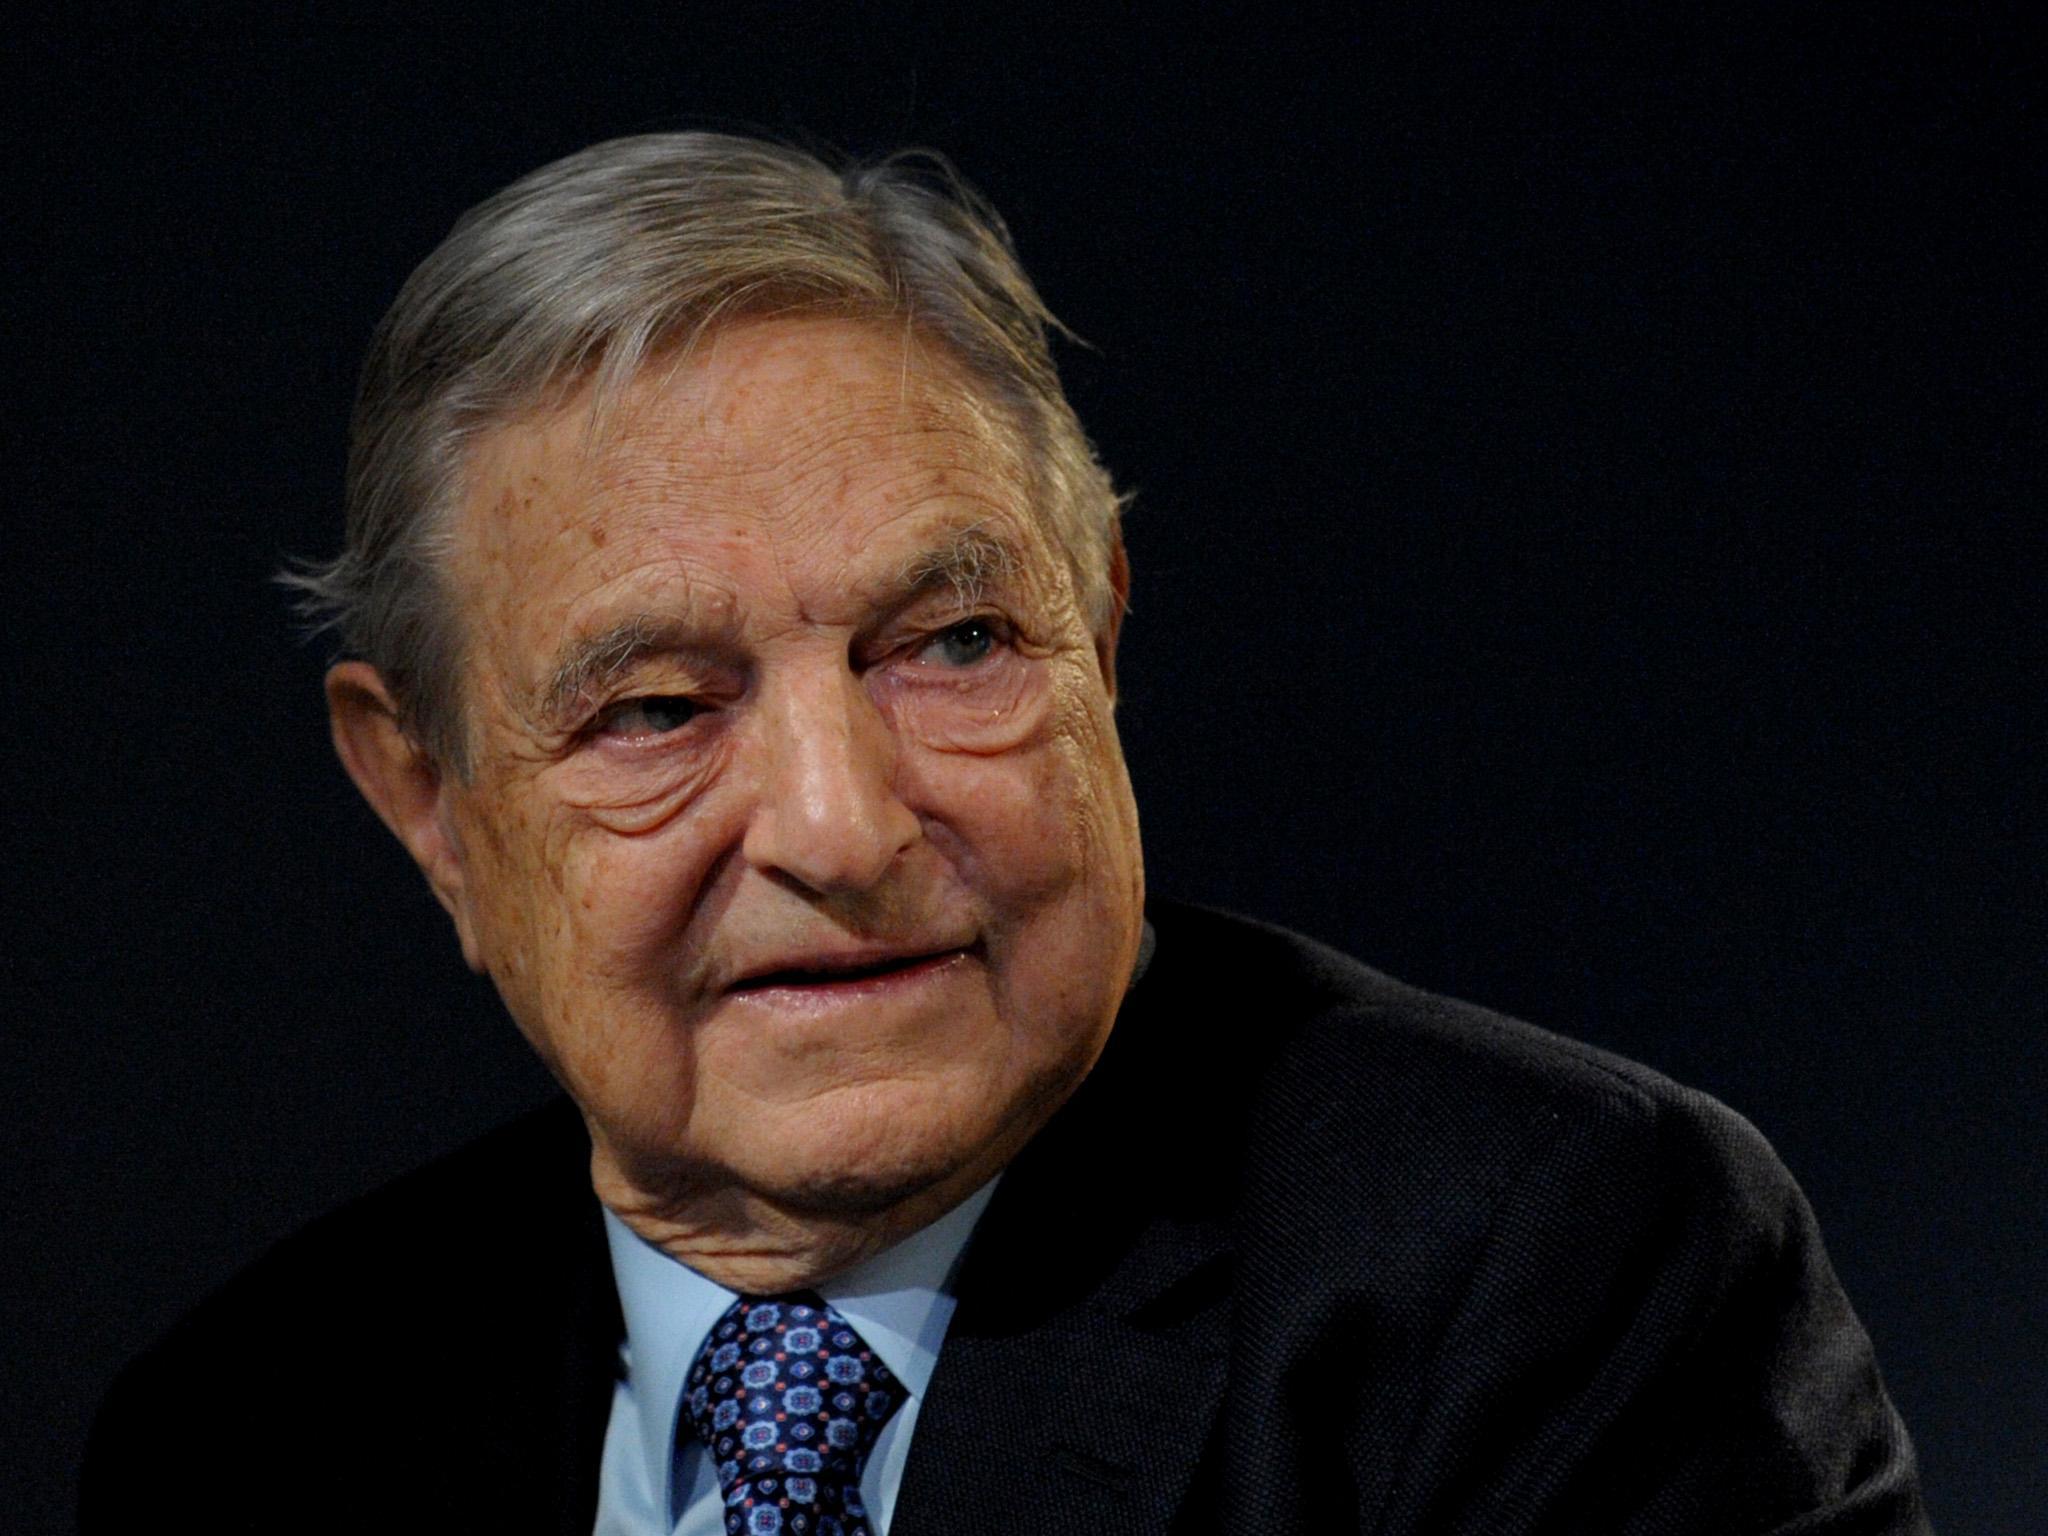 George Soros: Coronavirus endangers our civilisation